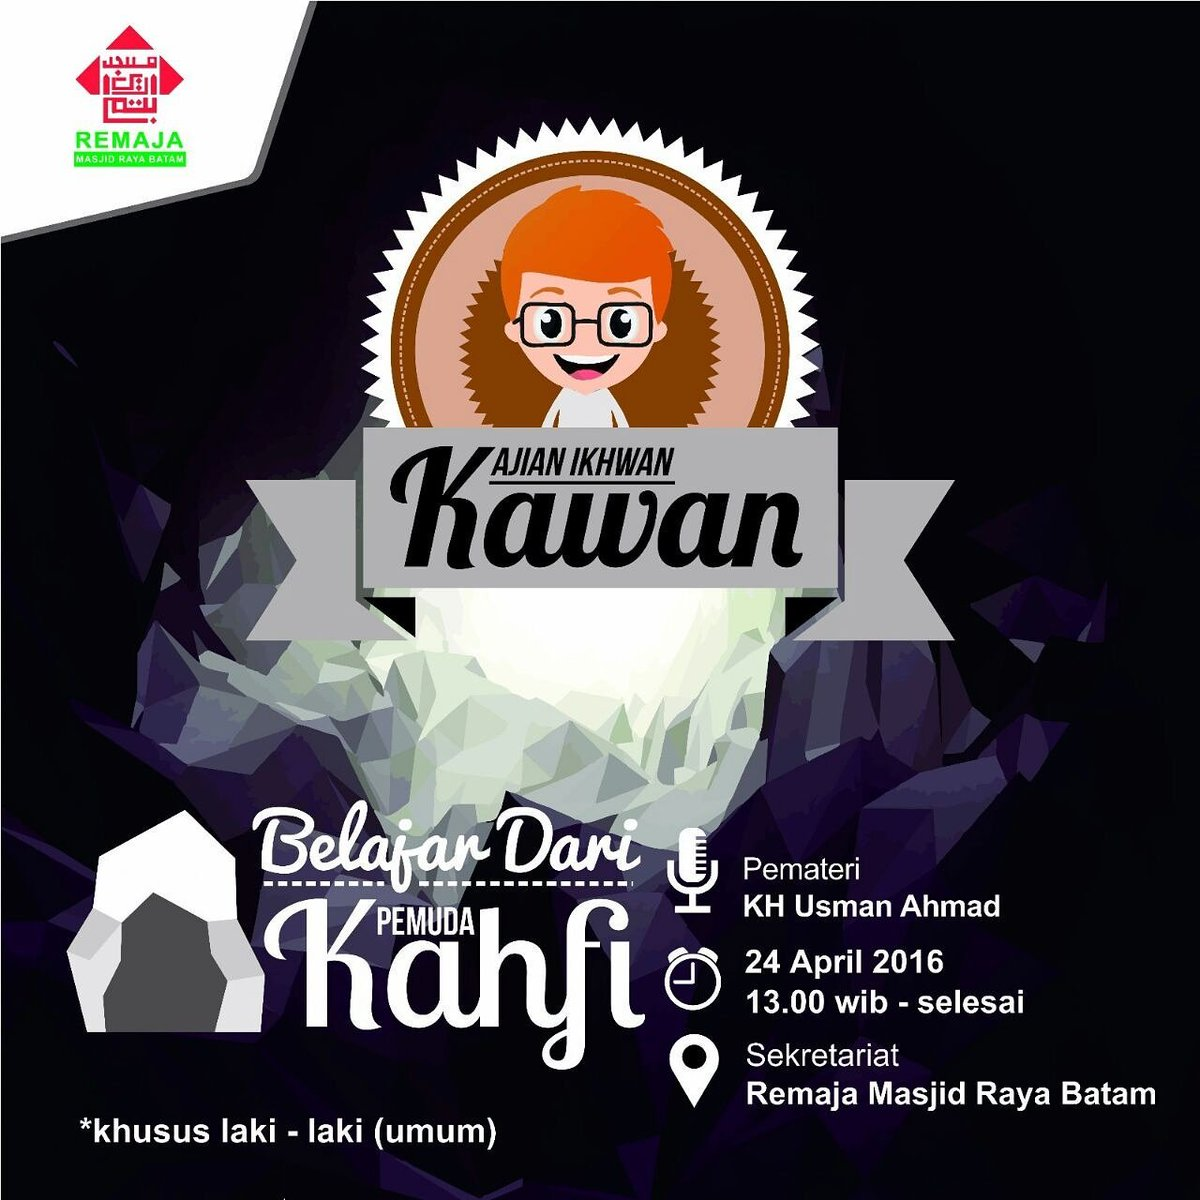 Remaja Masjid Batam On Twitter Kawan Belajar Dari Pemuda Kahfi